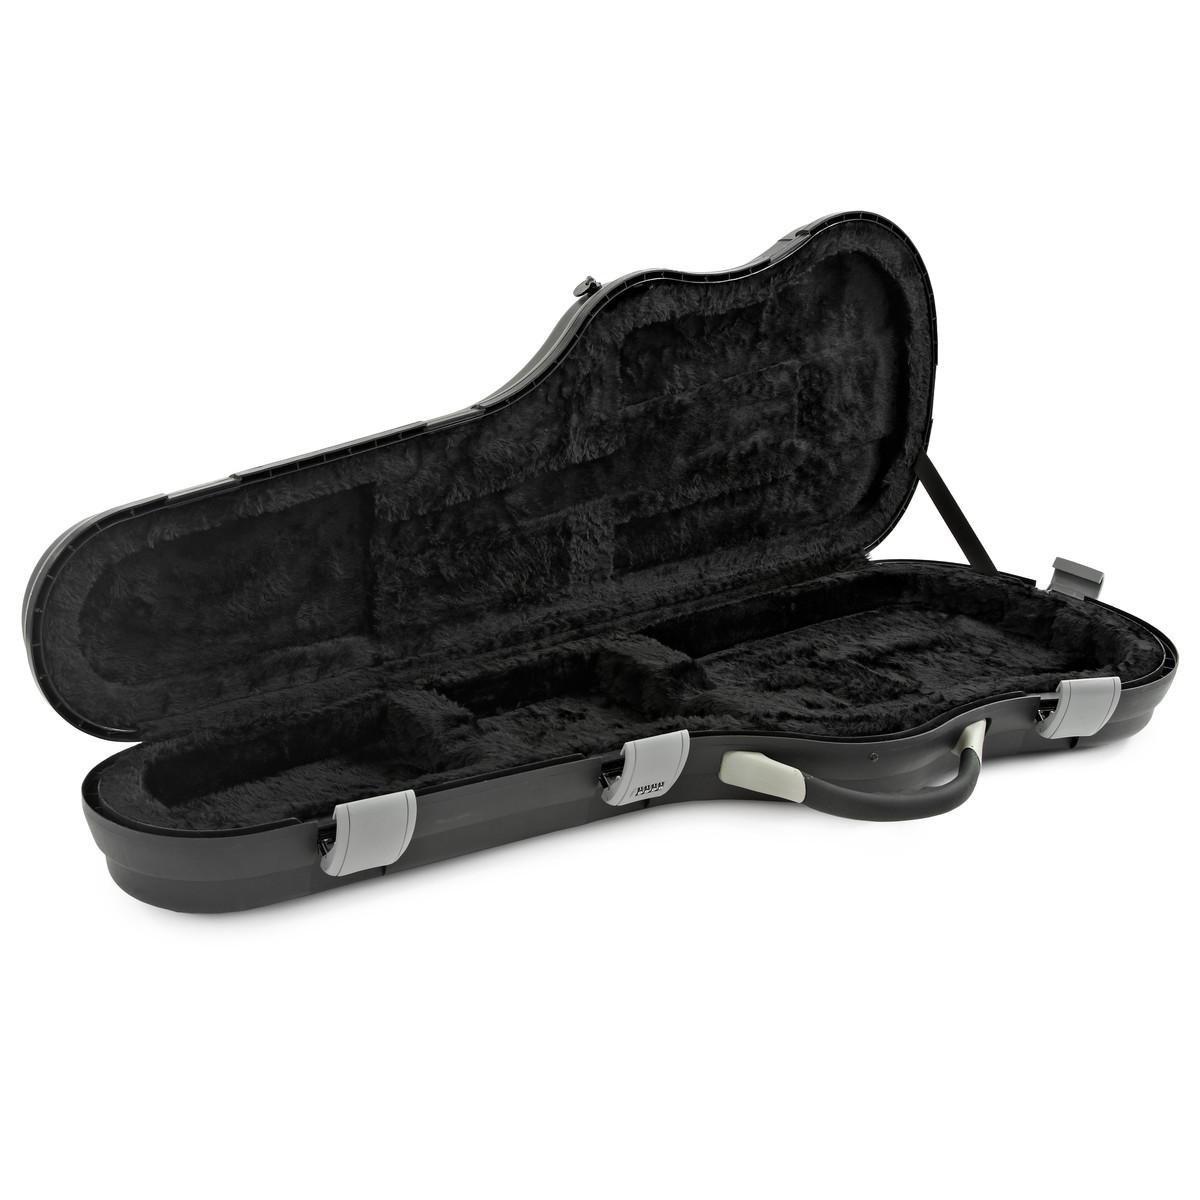 43060947a5 Deluxe Waterproof ABS Electric Guitar Case. EC-800. Loading zoom